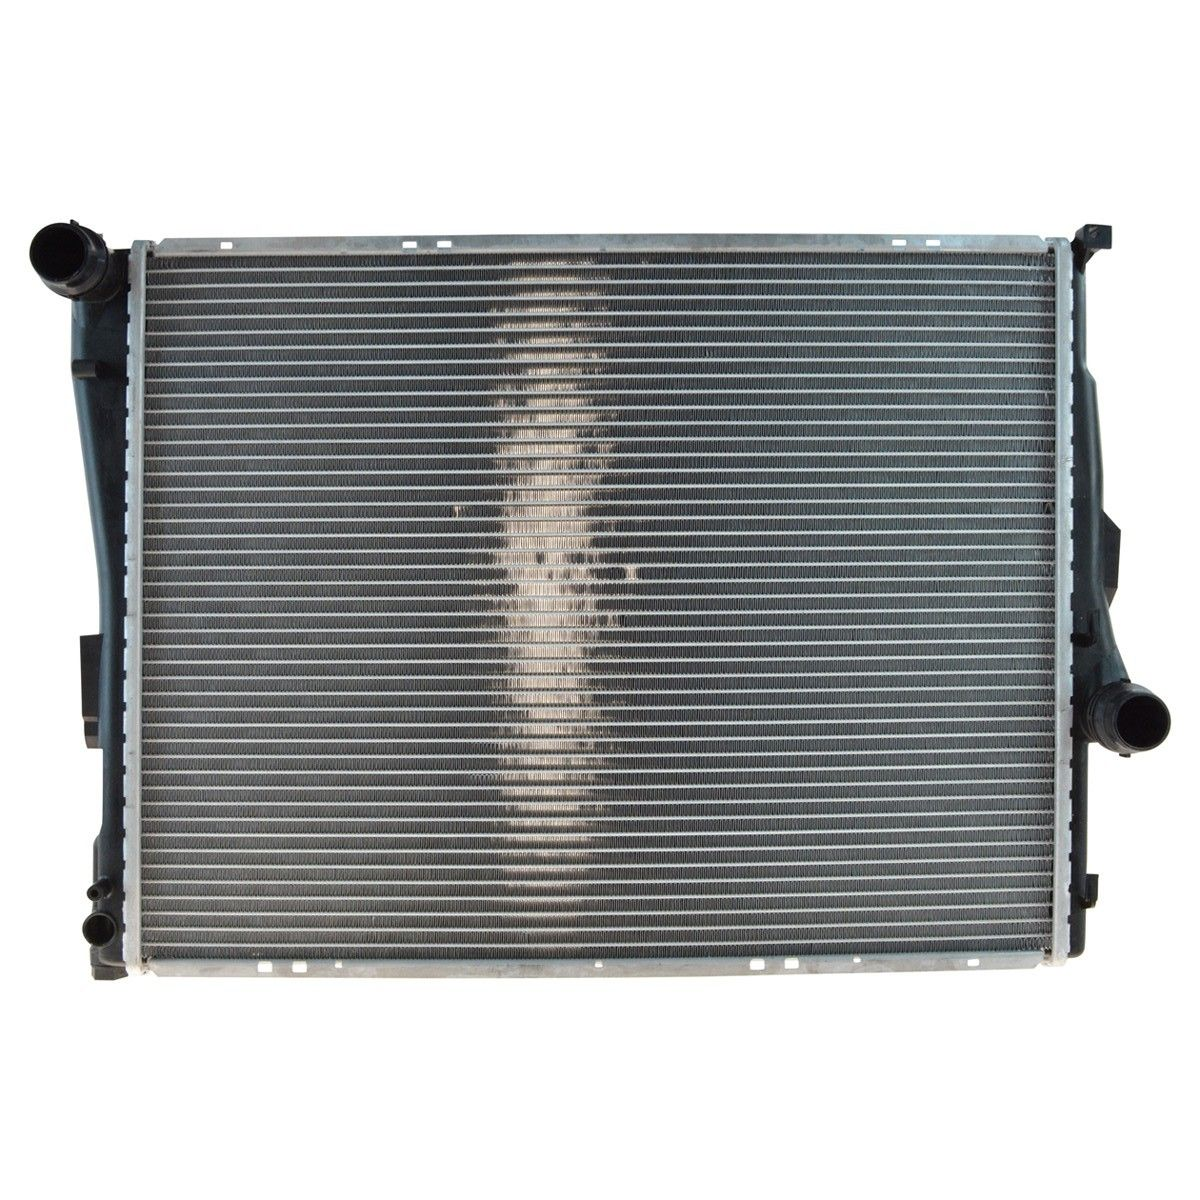 Radiator-1 Row Plastic Tank Aluminum Core Front CSF 3708